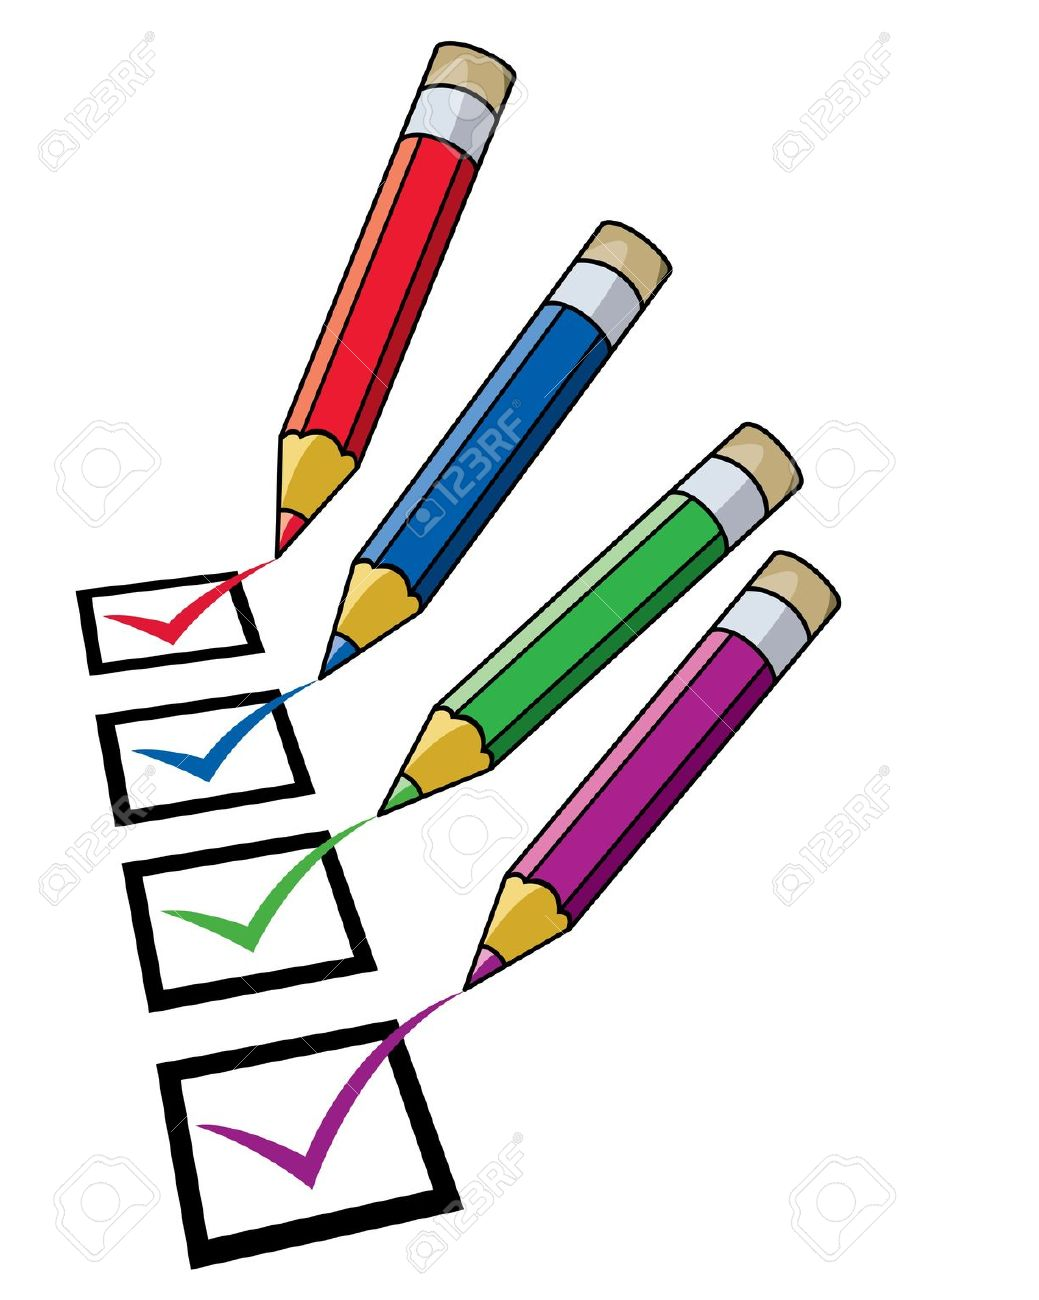 student checklist clipart - clipground